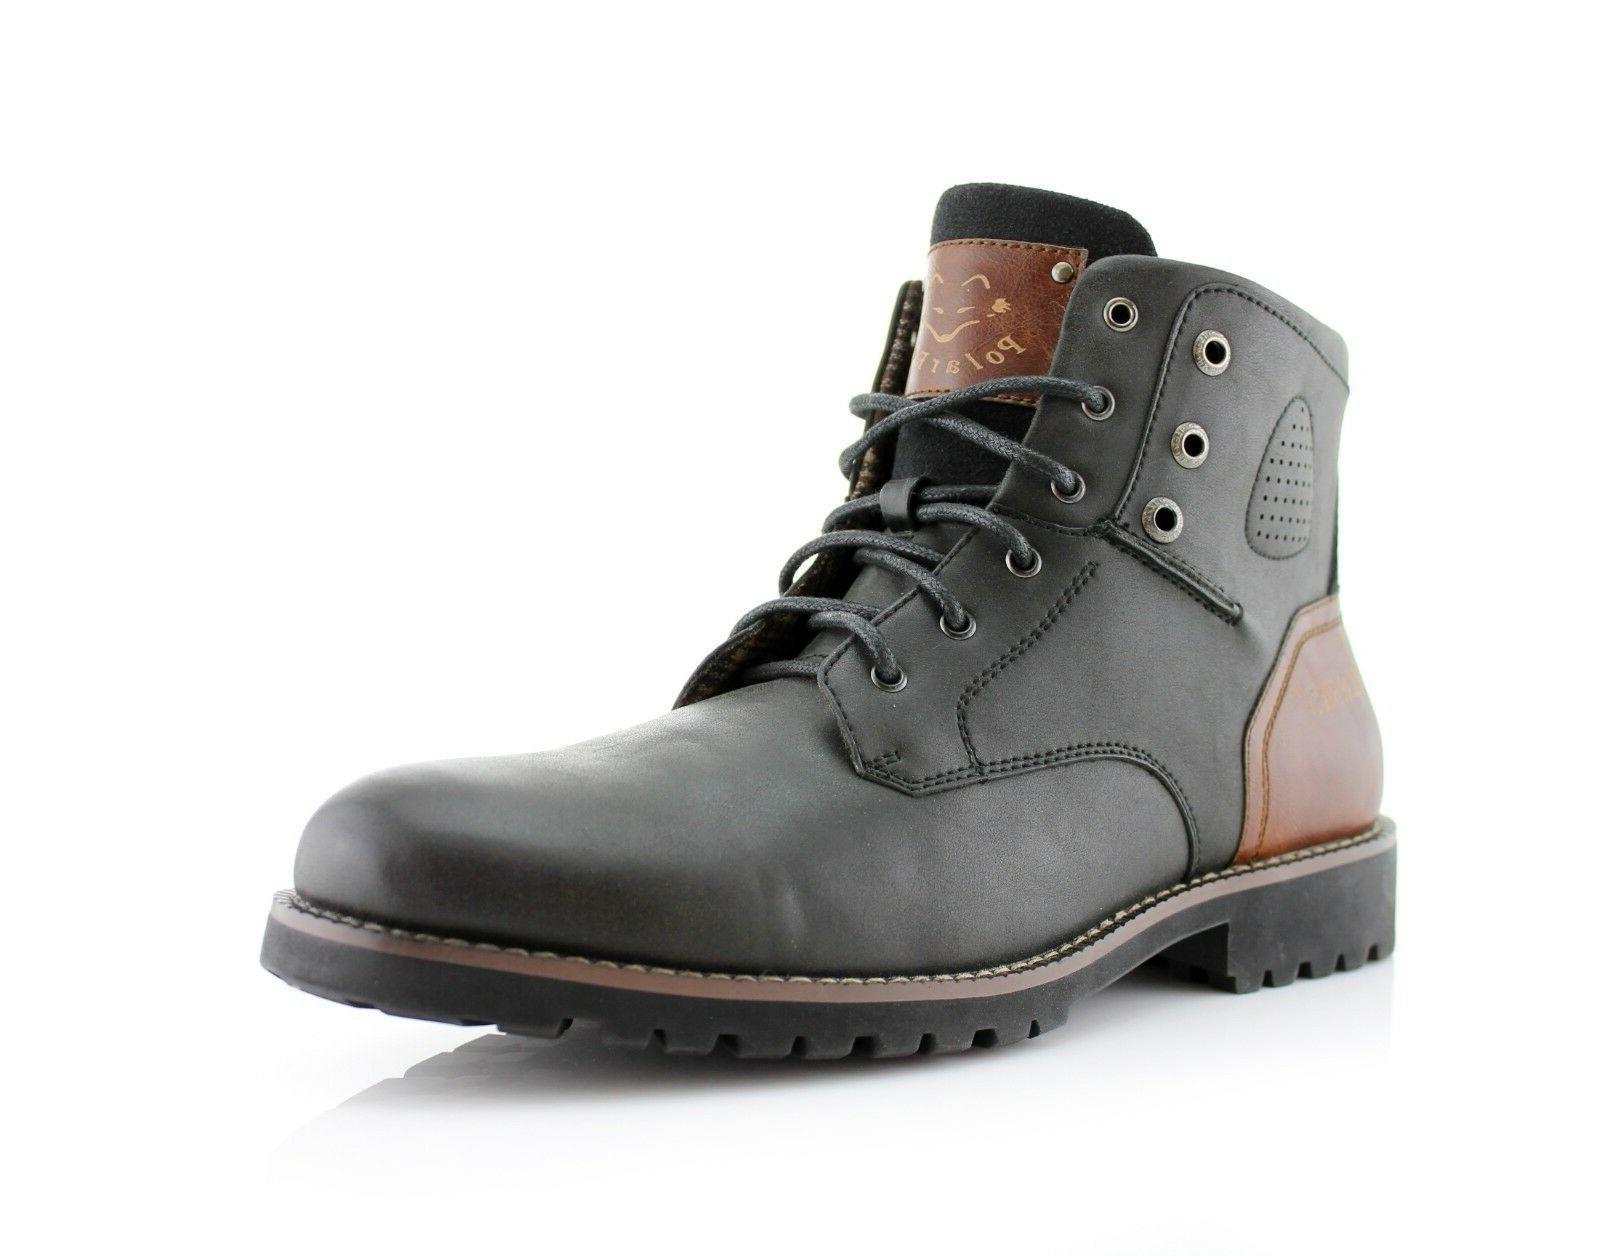 Men's Classic Riding Boots